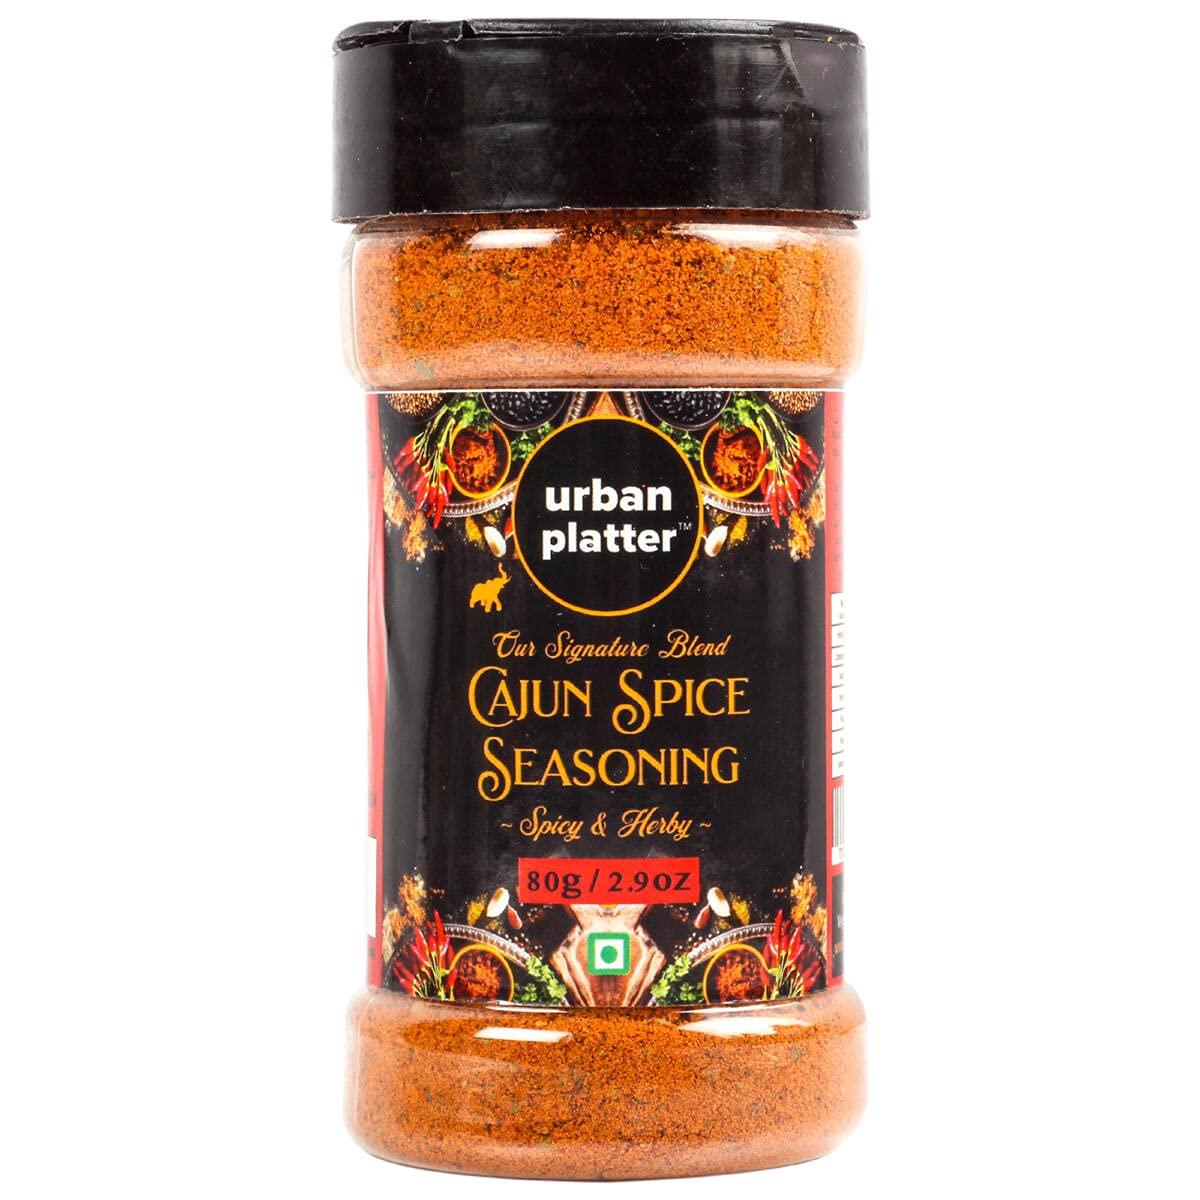 Urban Platter Cajun Spice Seasoning Spicy Selling and selling Her Inexpensive Jar Shaker 80g